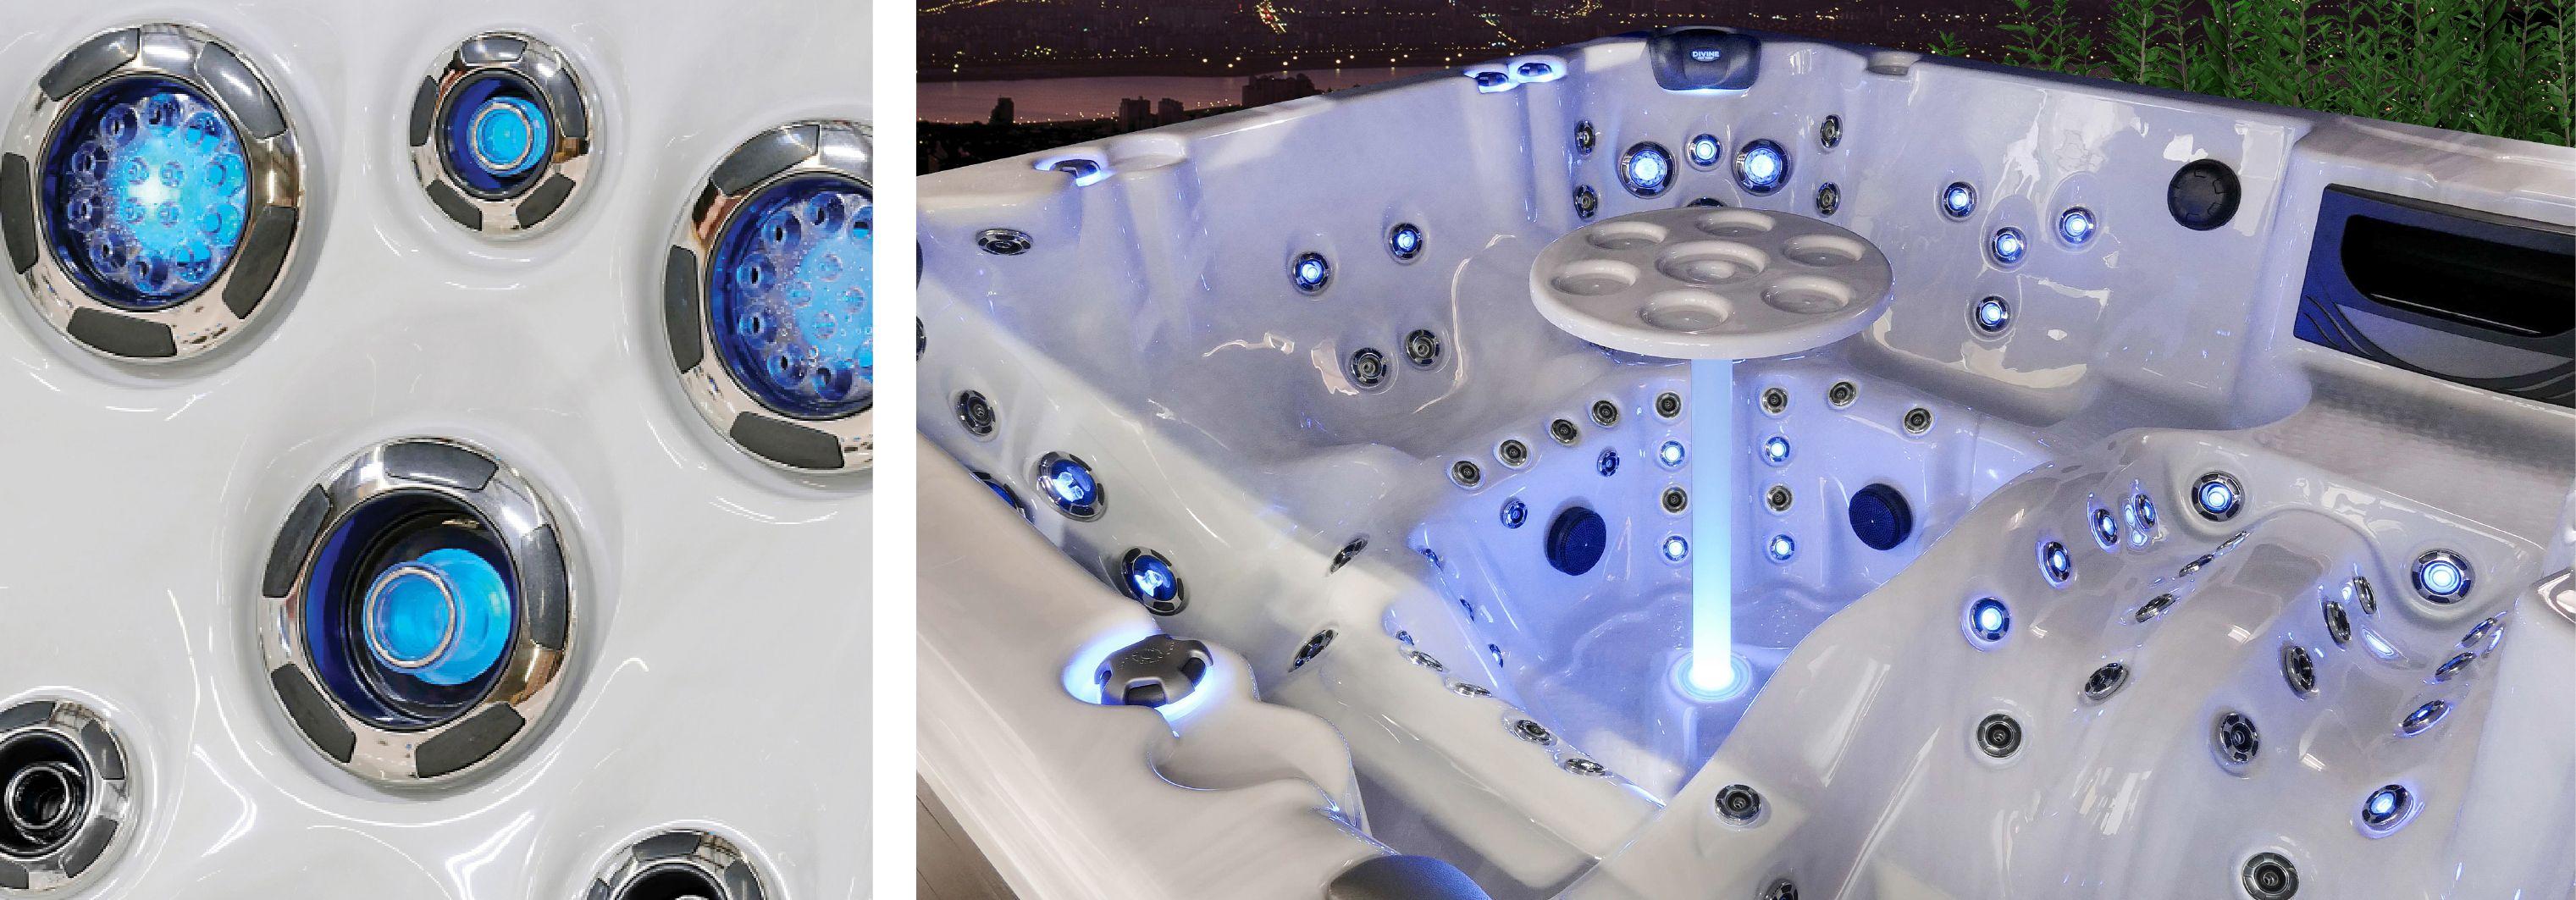 Beauty & Health Apprehensive Fully Automatic Electric Roller Feet Basin Heating Foot Tub Foot Massage Machine Foot Spa Bath Massager Us Plug New Bath & Shower